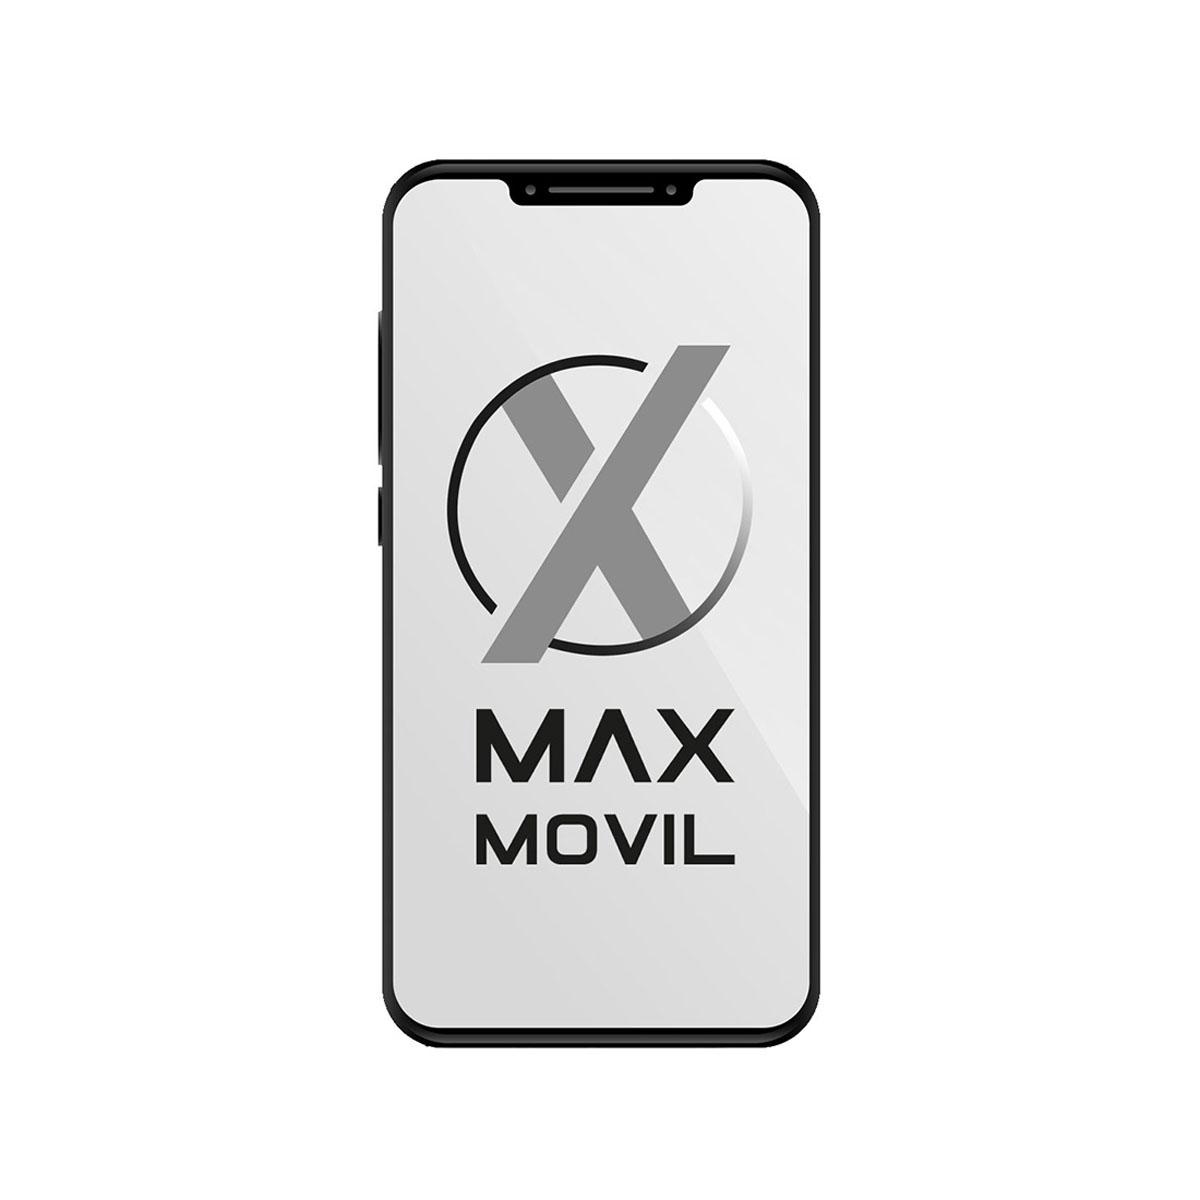 Tapa protectora original LG Nexus 5 negra